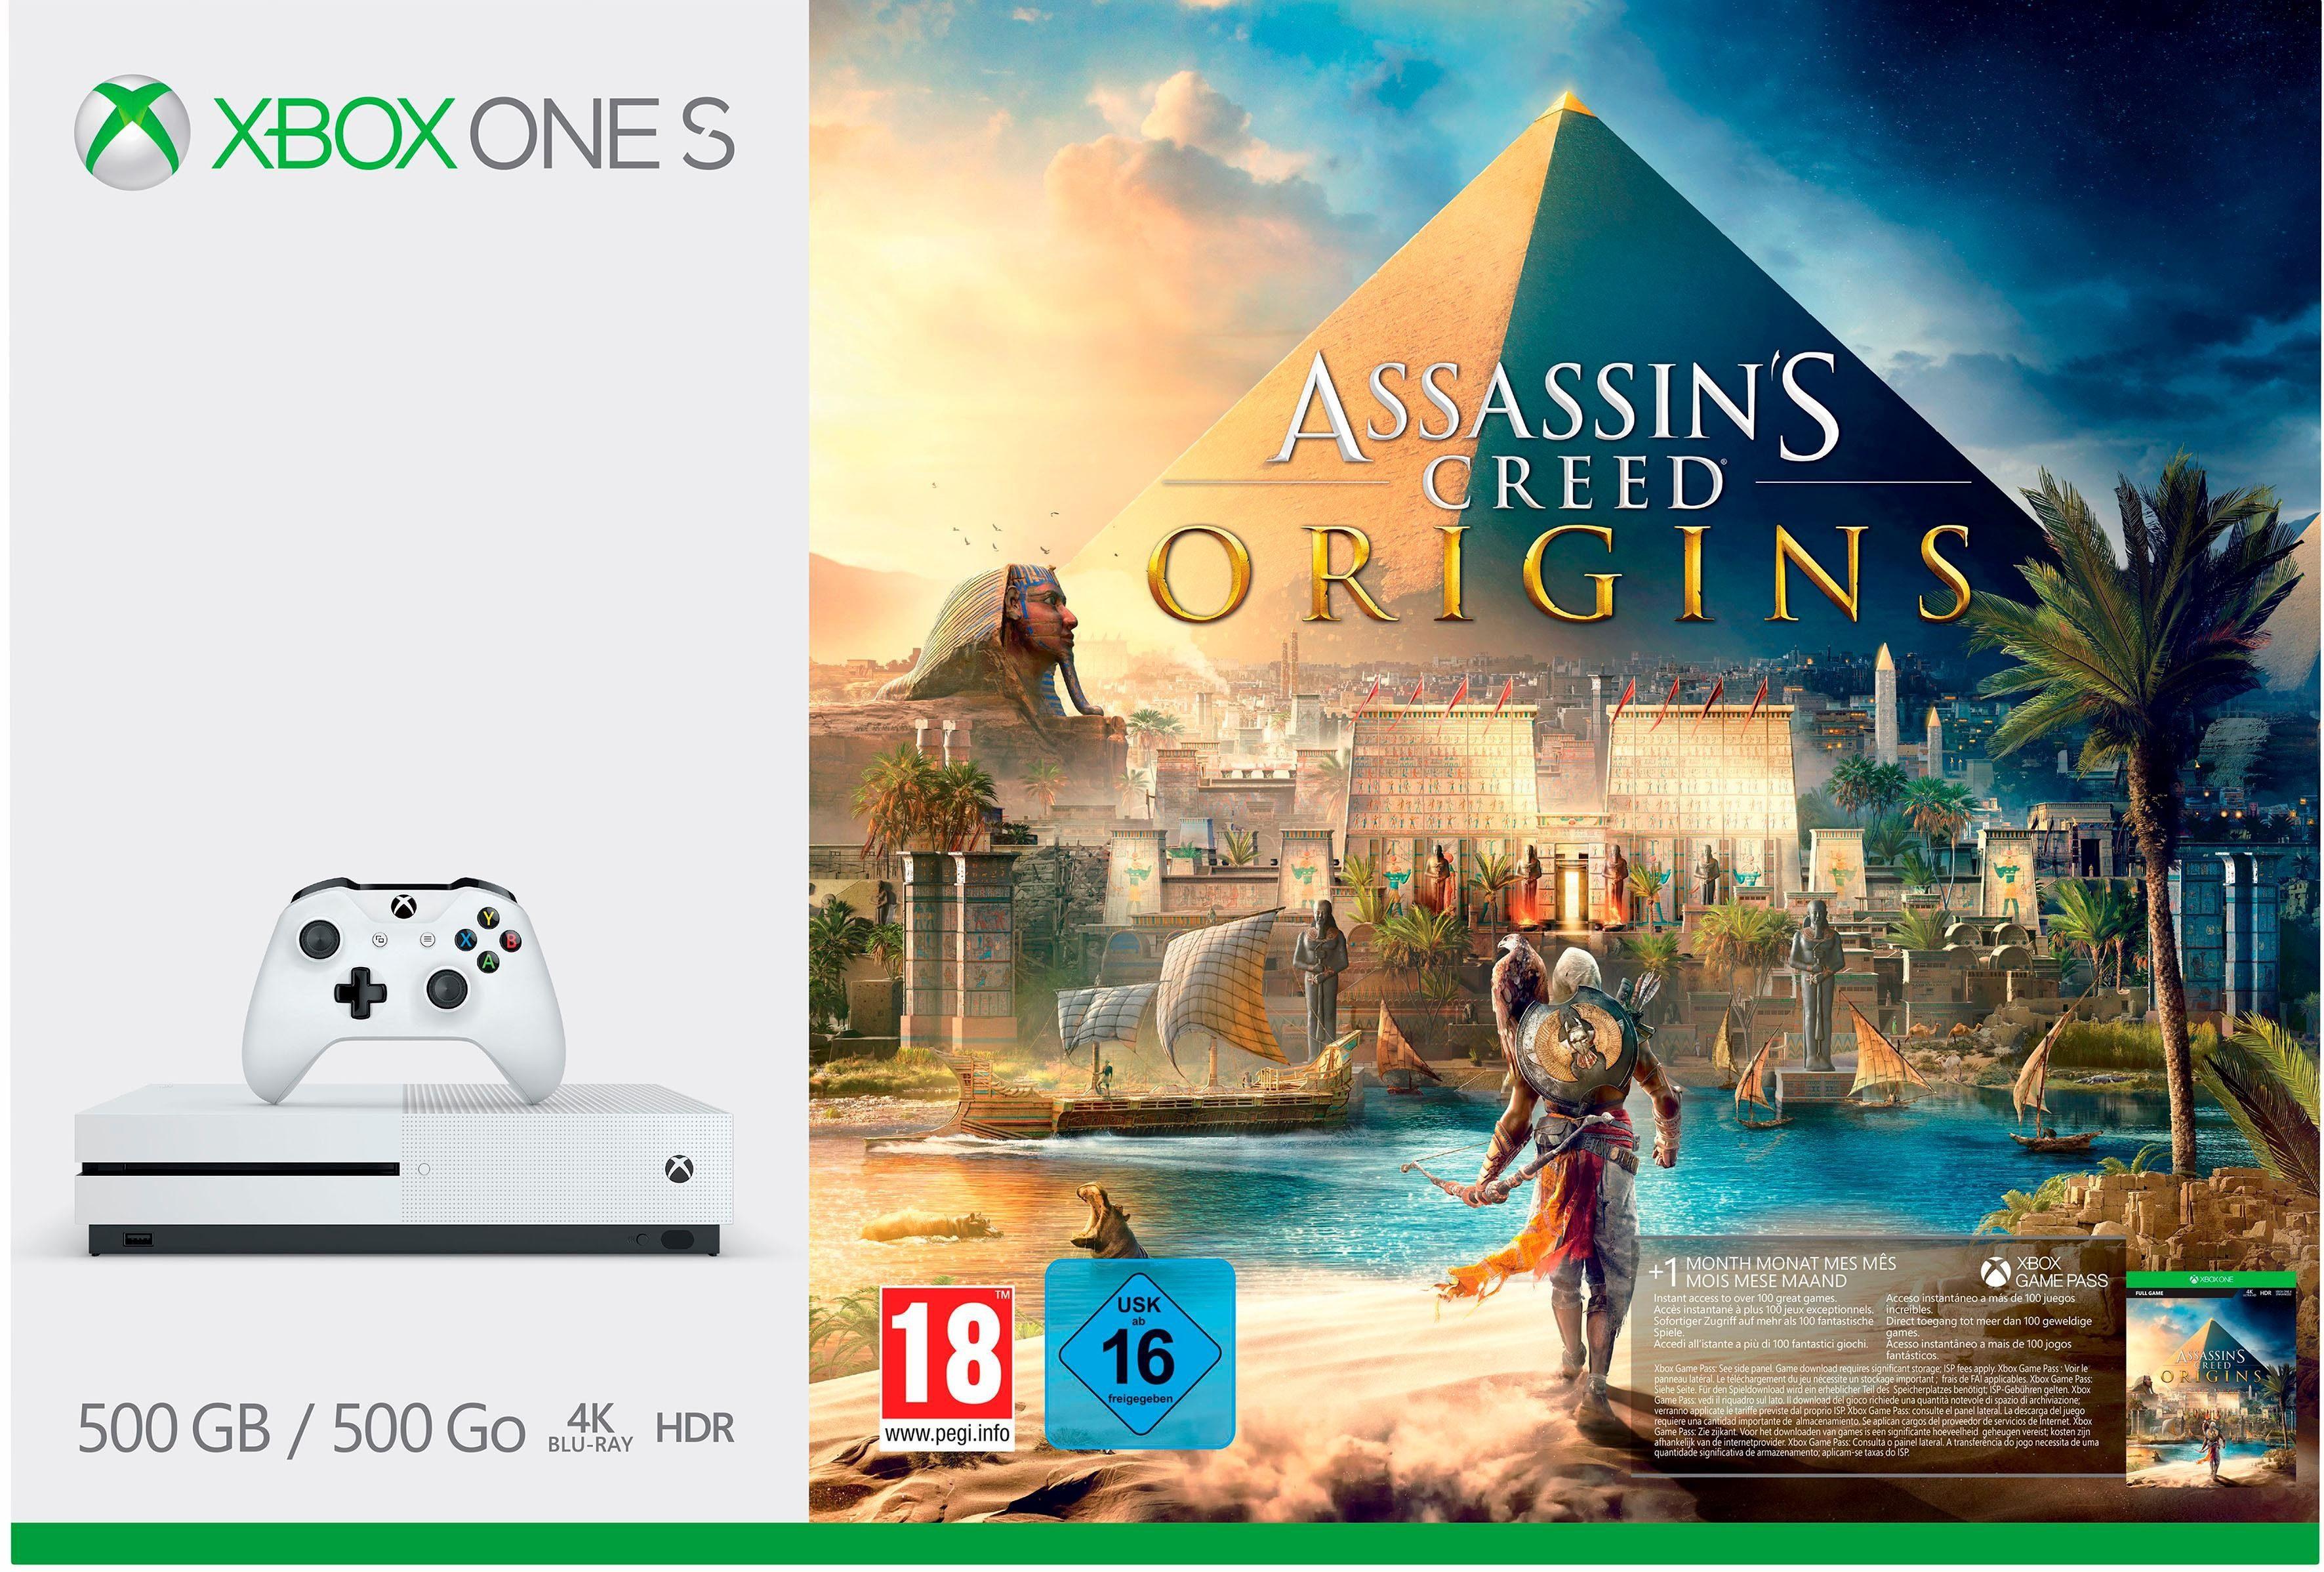 Xbox One S 500 GB + Assassins Creed Origins (DLC), 4K Ultra HD